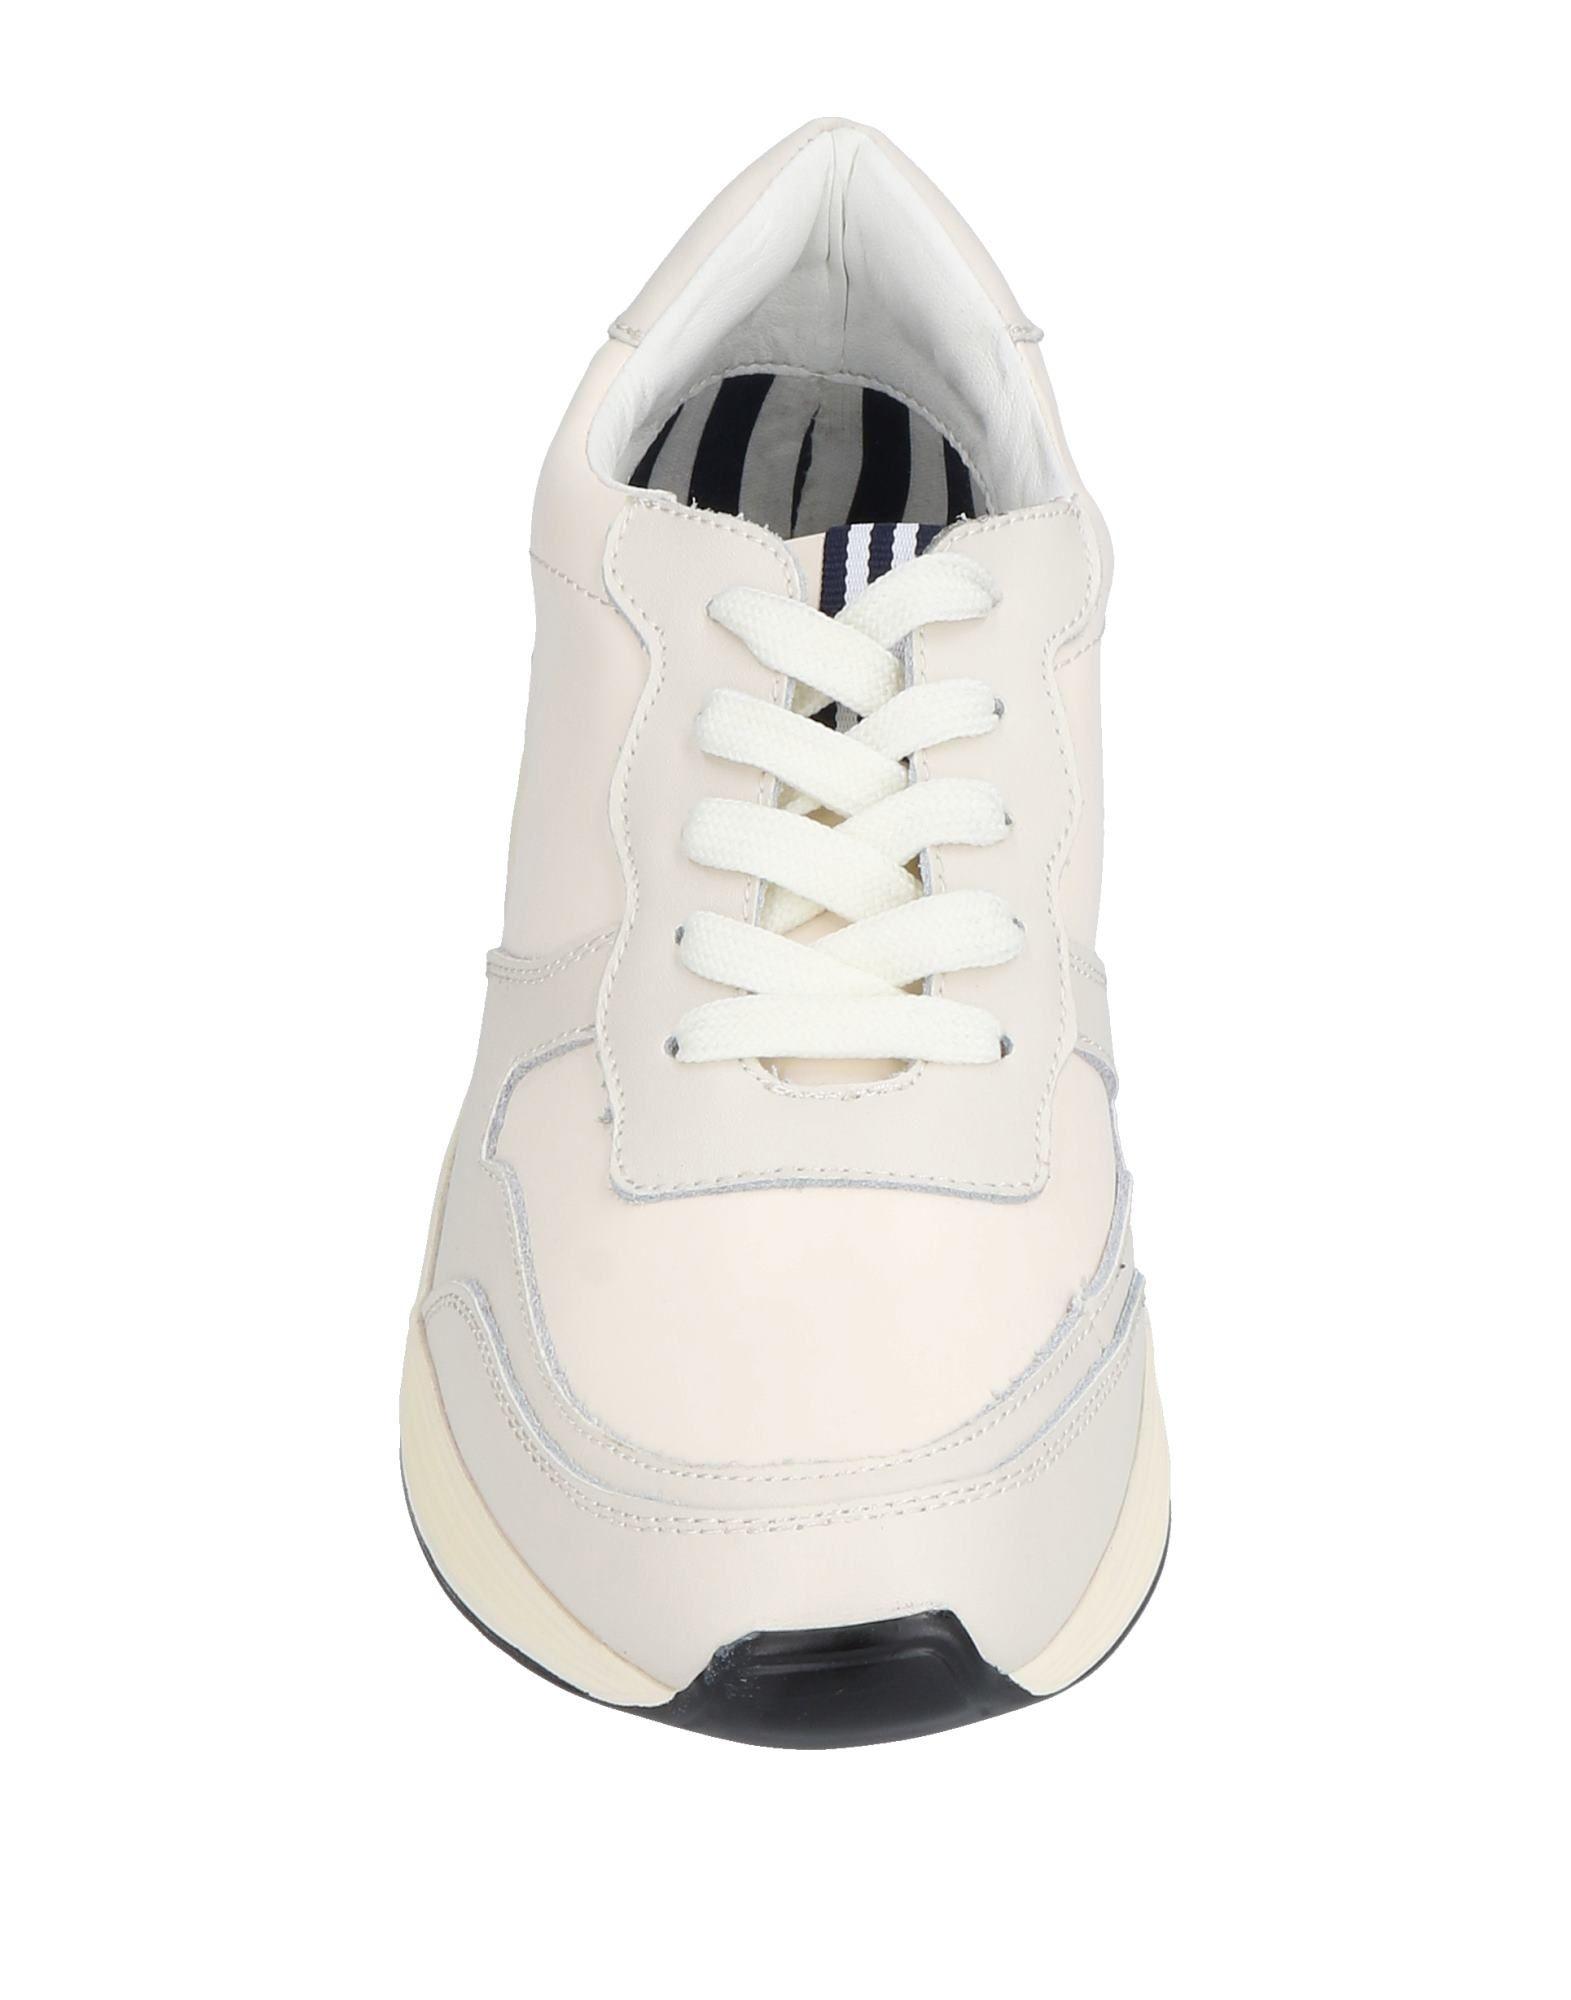 Marina Yachting Sneakers Damen  11505032NG Gute Qualität beliebte beliebte beliebte Schuhe 0bad12